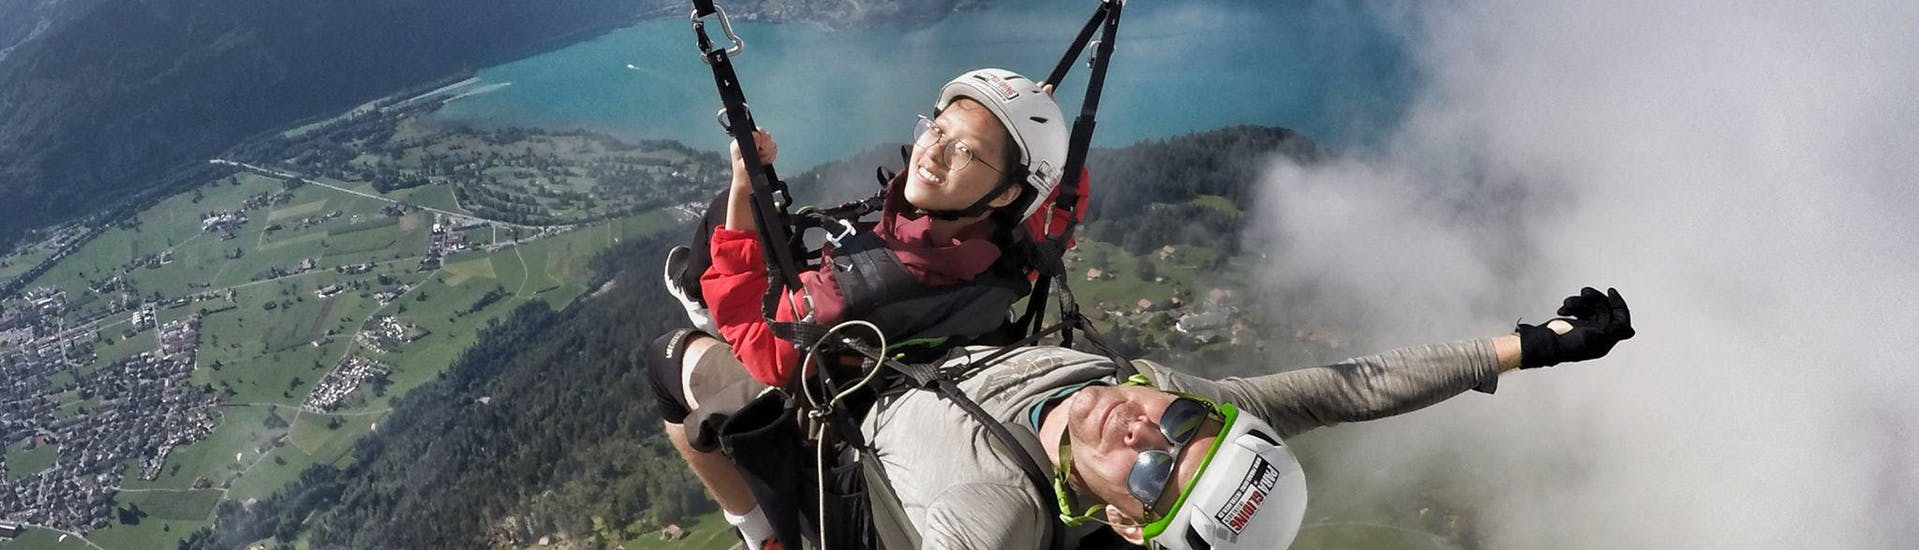 "During the Tandem Paragliding ""Big Blue"" - Jungfrau Massive with Paragliding Interlaken, a passenger and her certified tandem pilot are enjoying the fantastic view over Interlaken."